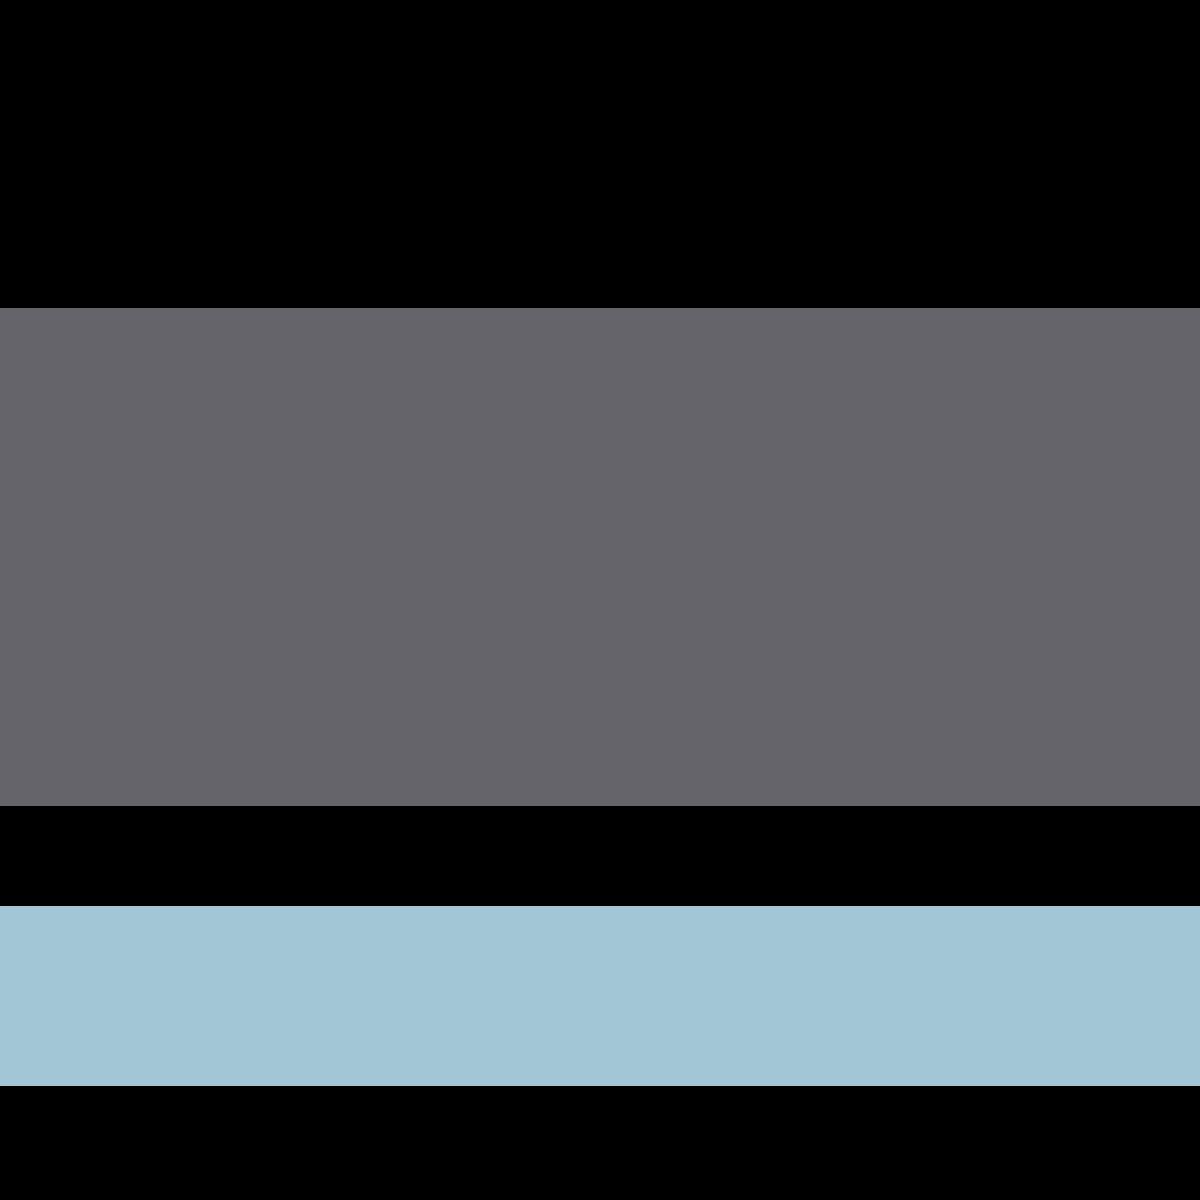 St Louis Park Mn Apartments: Minikahda Court Apartments In Saint Louis Park, MN